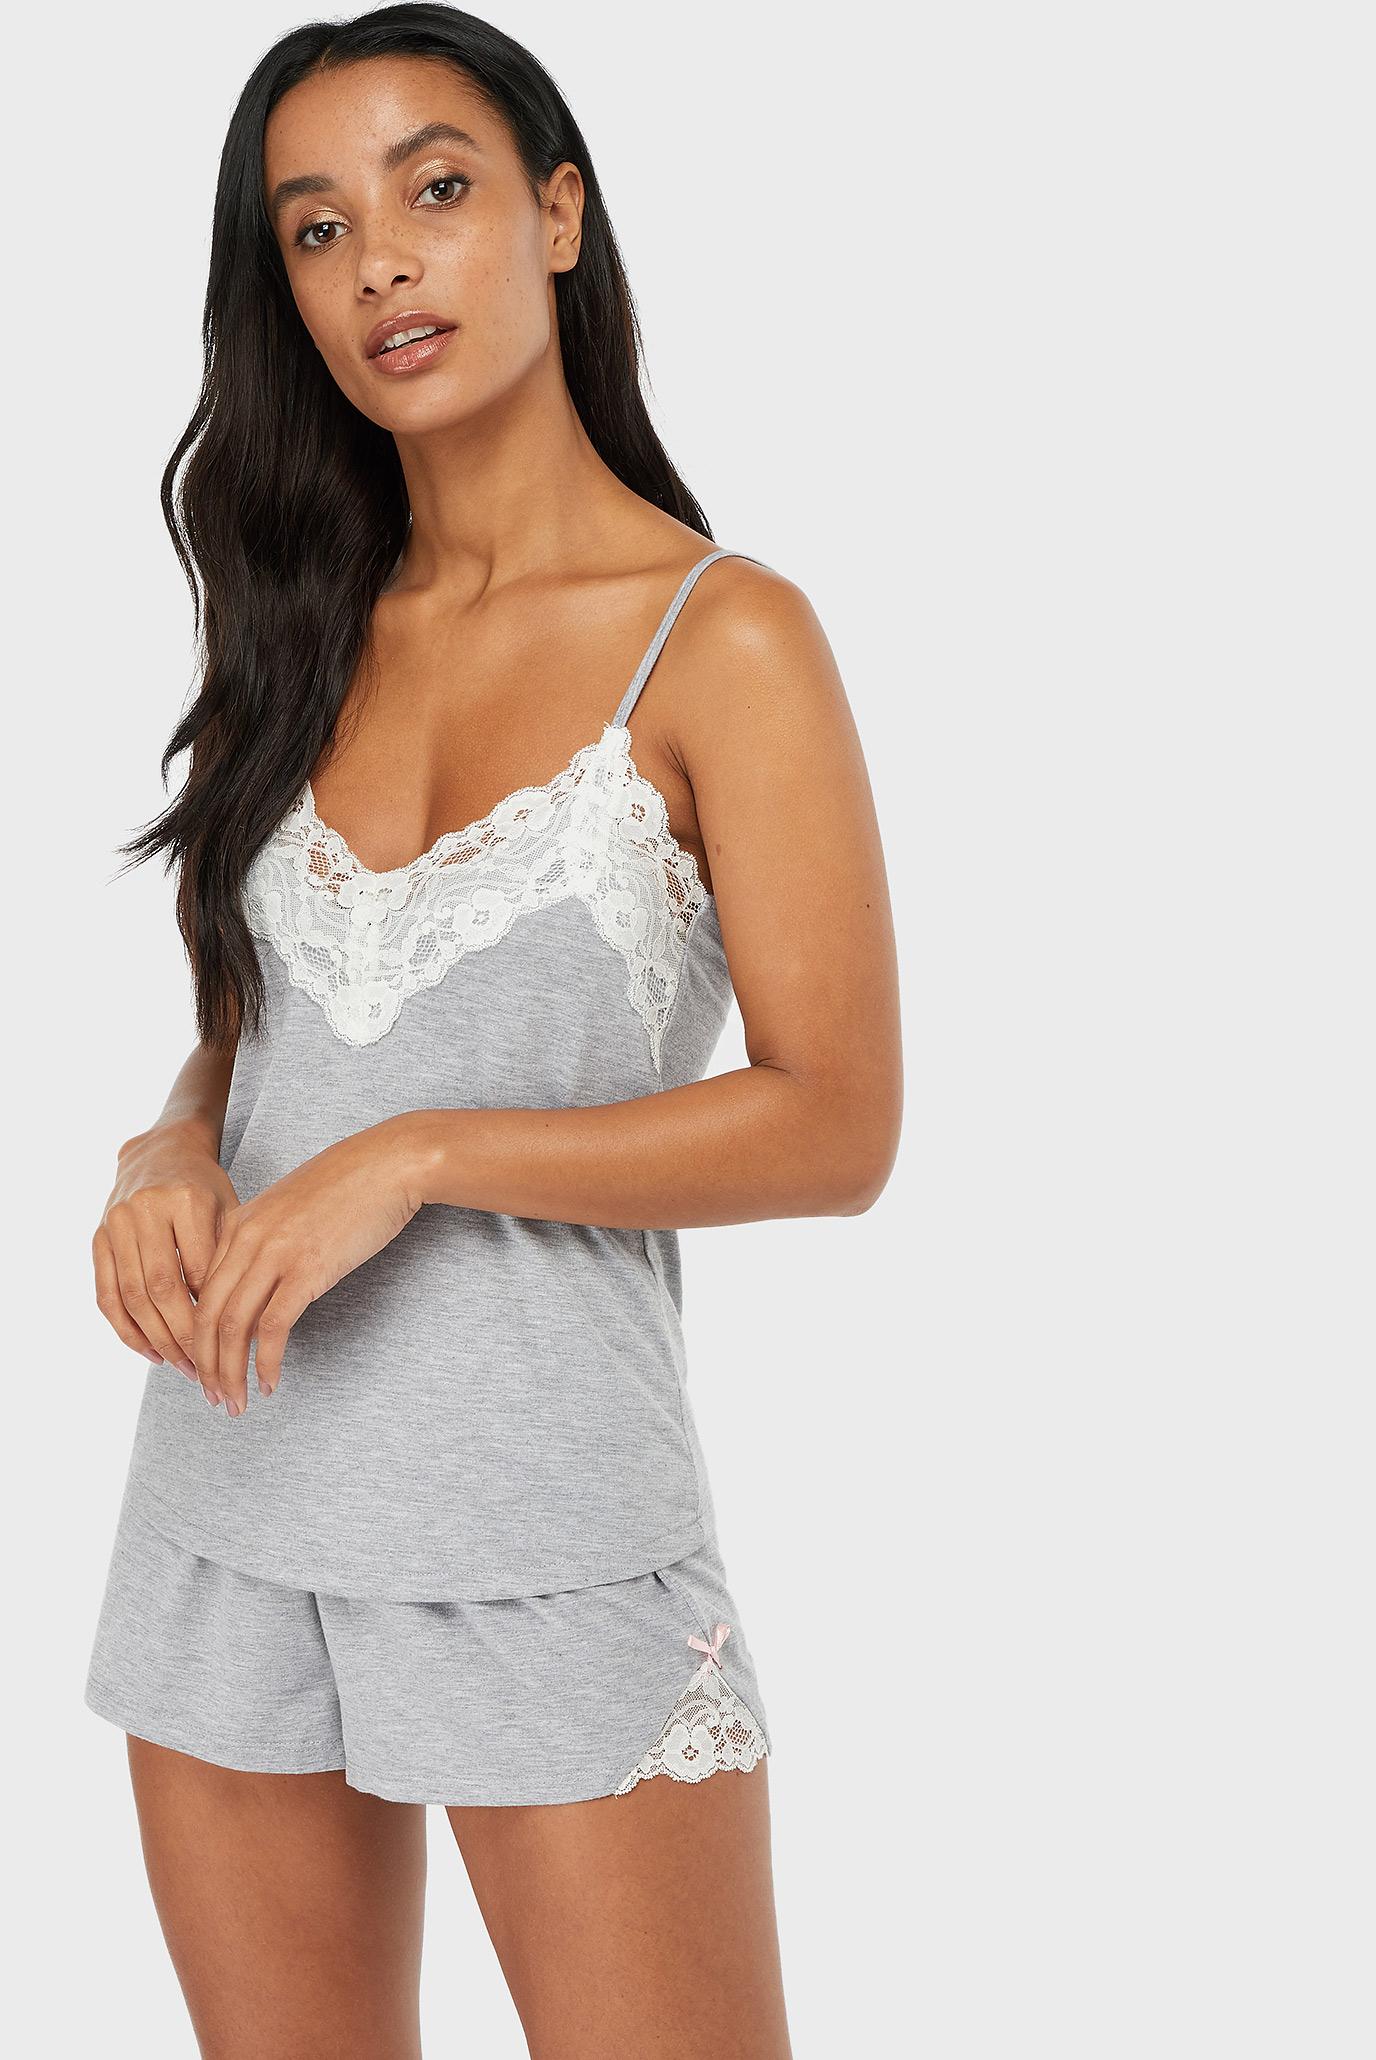 Женская серая пижама Teya Plain Vest Set 1